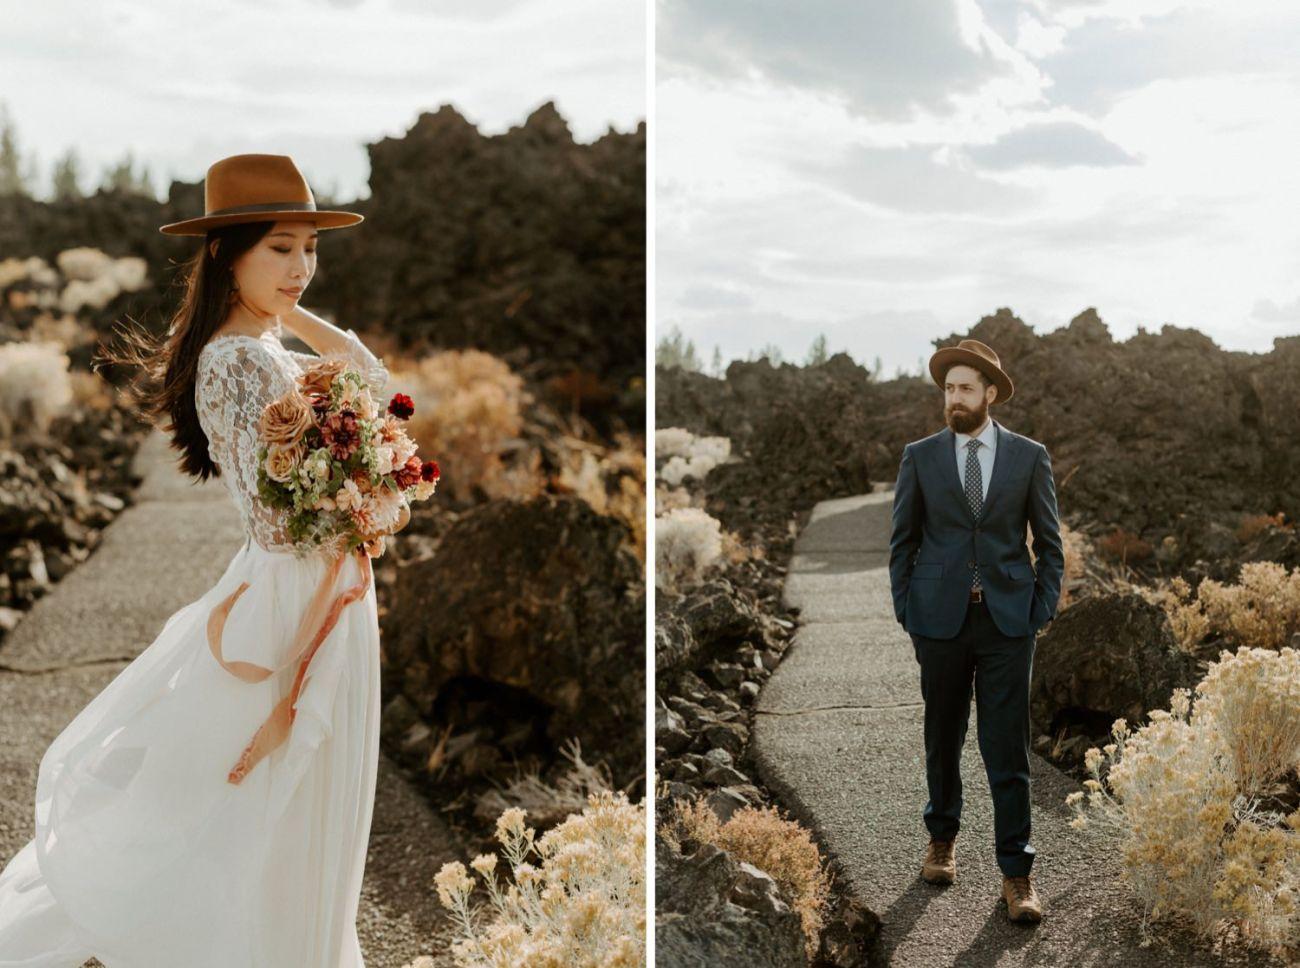 Newberry Volcano Elopement Bend Elopement Bridal Session Bend Wedding Photographer Anais Possamai Photography 011